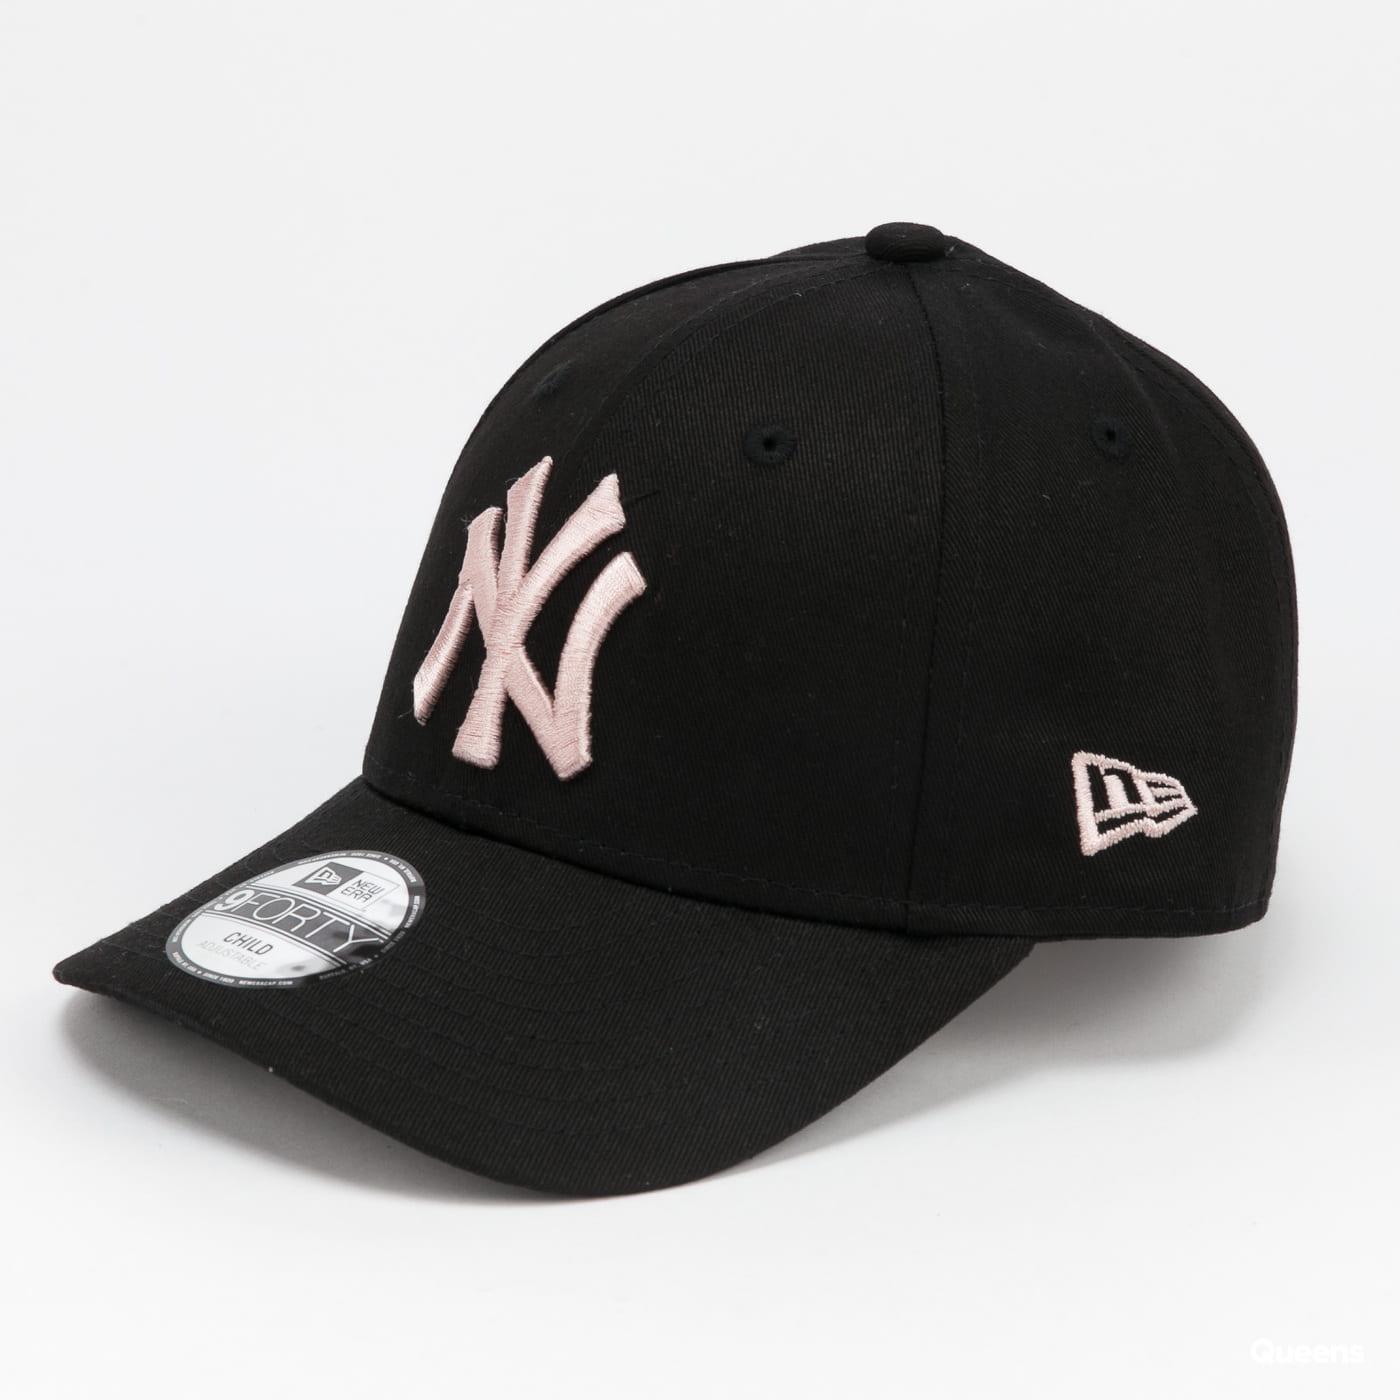 New Era 940K MLB CY Colour Essential NY black / light pink